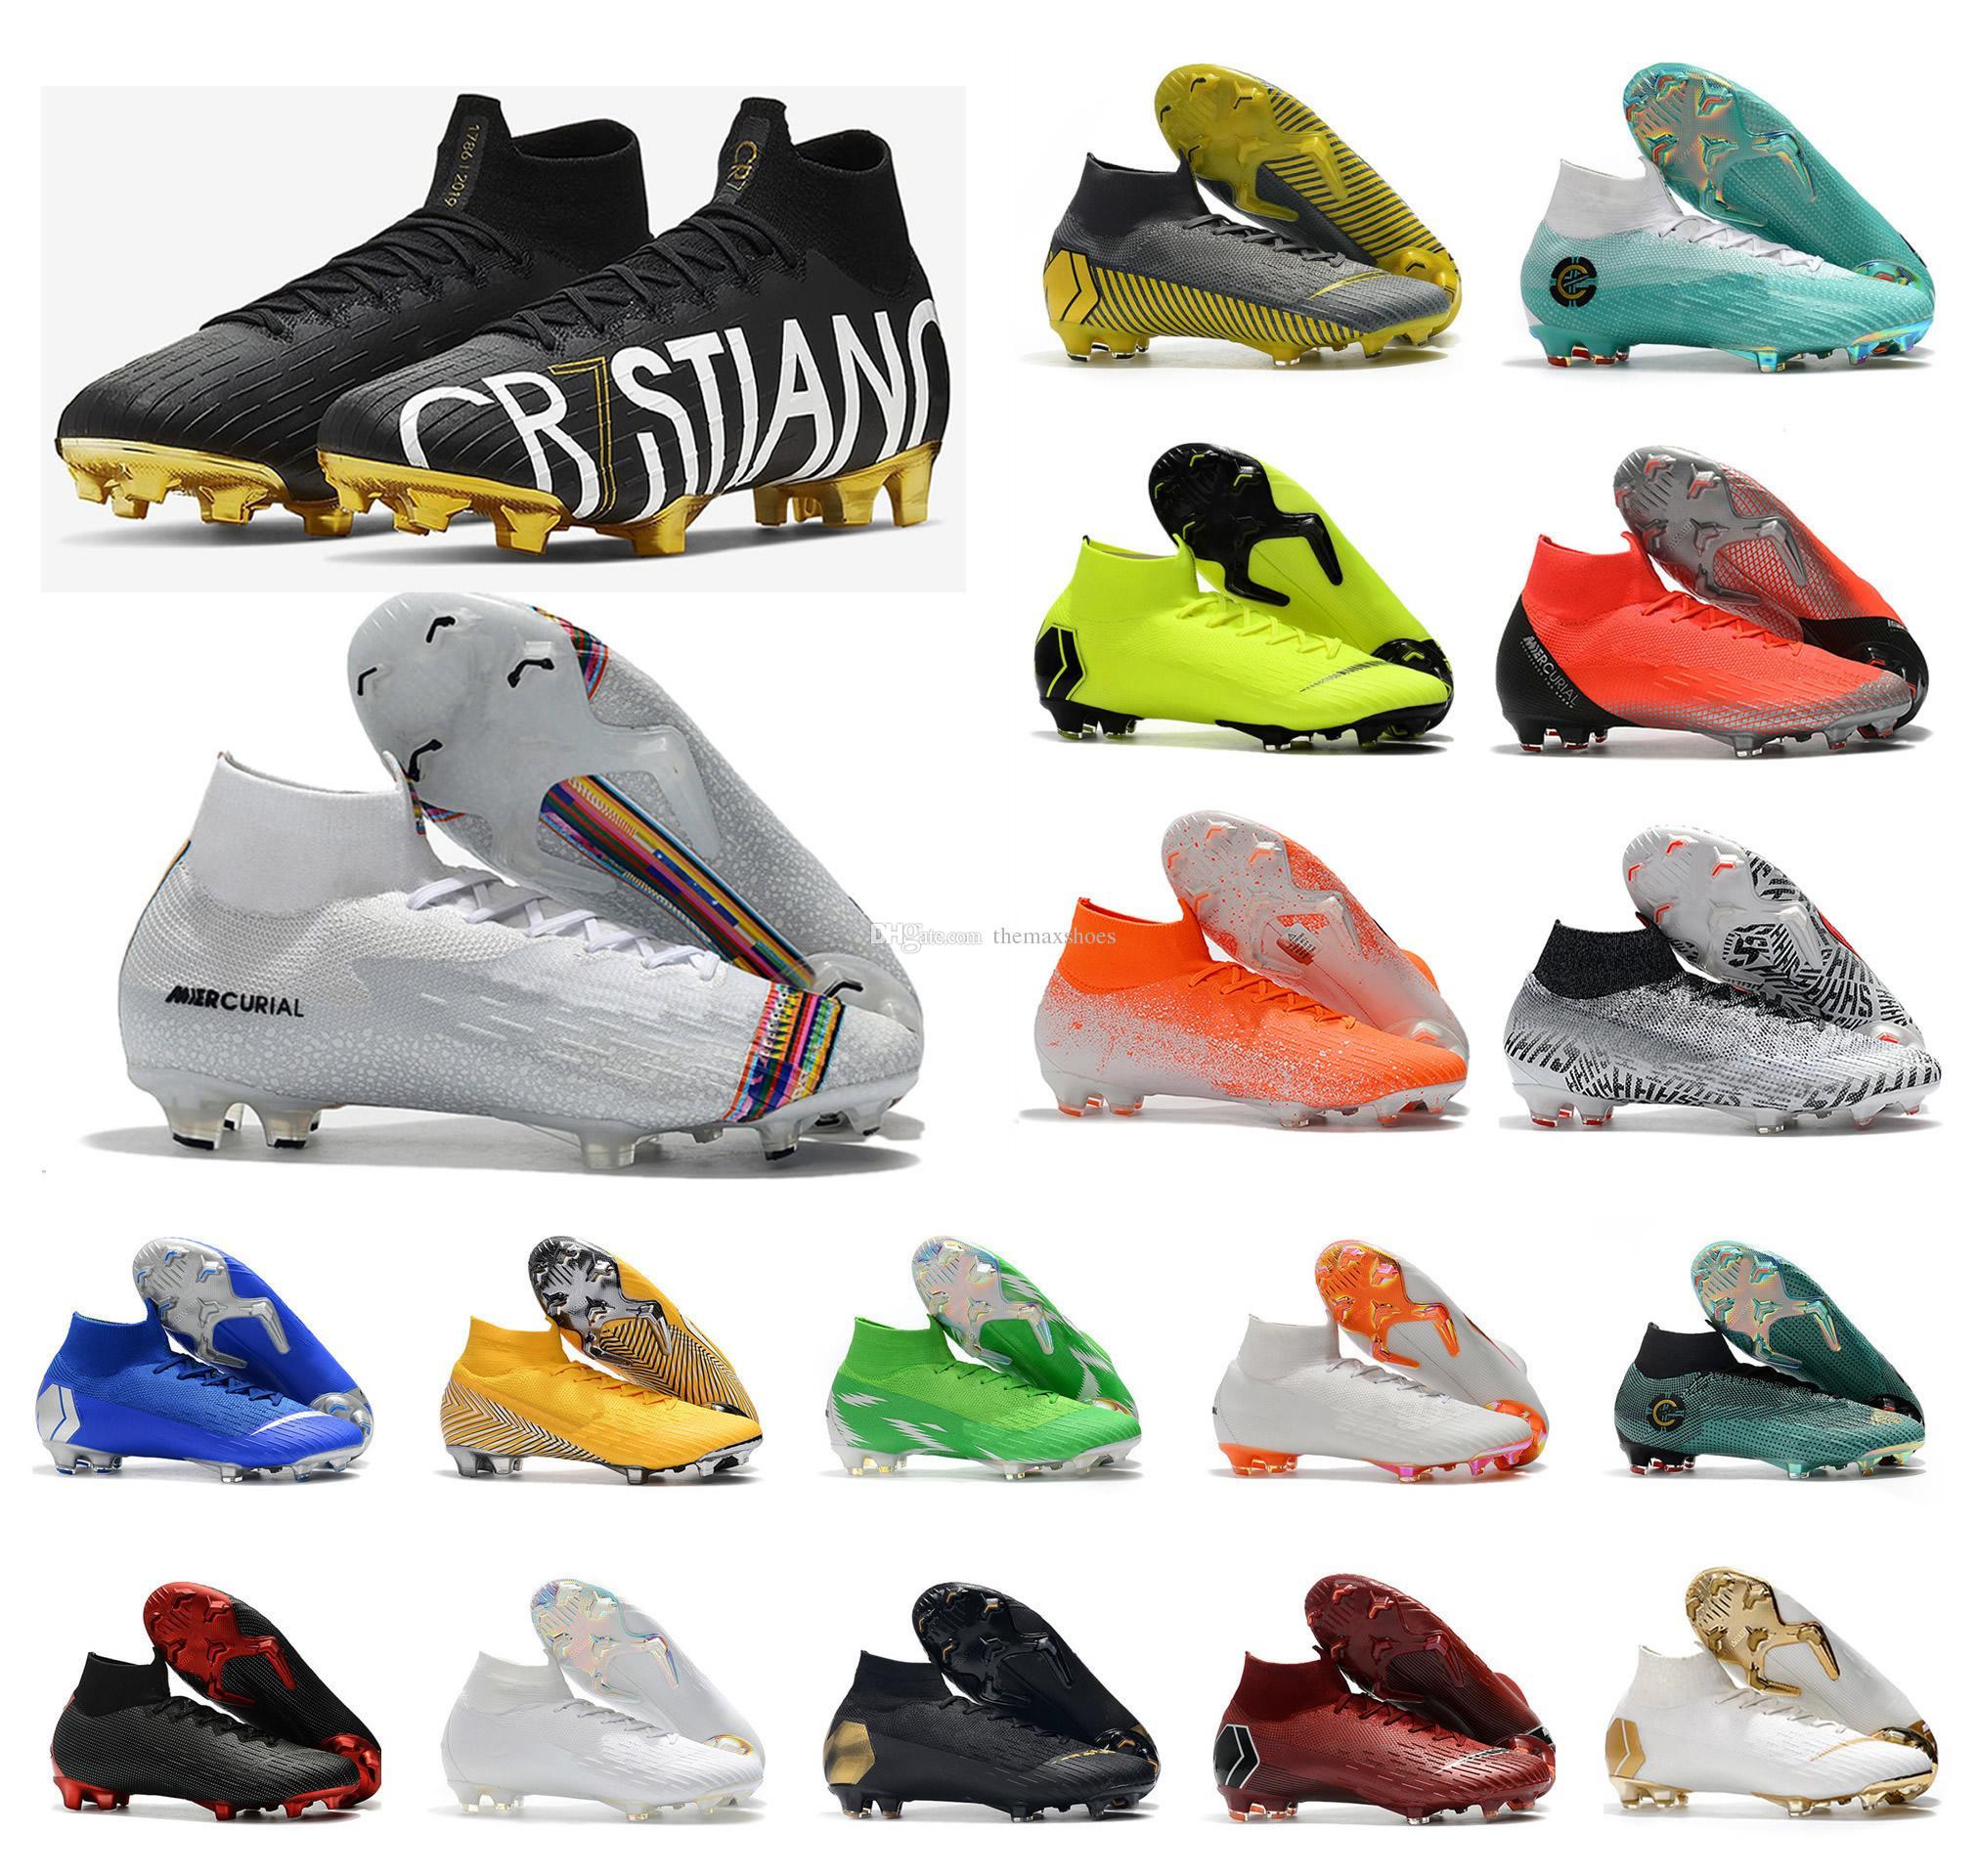 reputable site 6a9d8 8c953 New Mercurial Superfly 6 Elite CR7 SE FG VI 360 Ronaldo Neymar Mens XII 12  Women Boys High Soccer Shoes Football Boots Cleats Size US 3-11